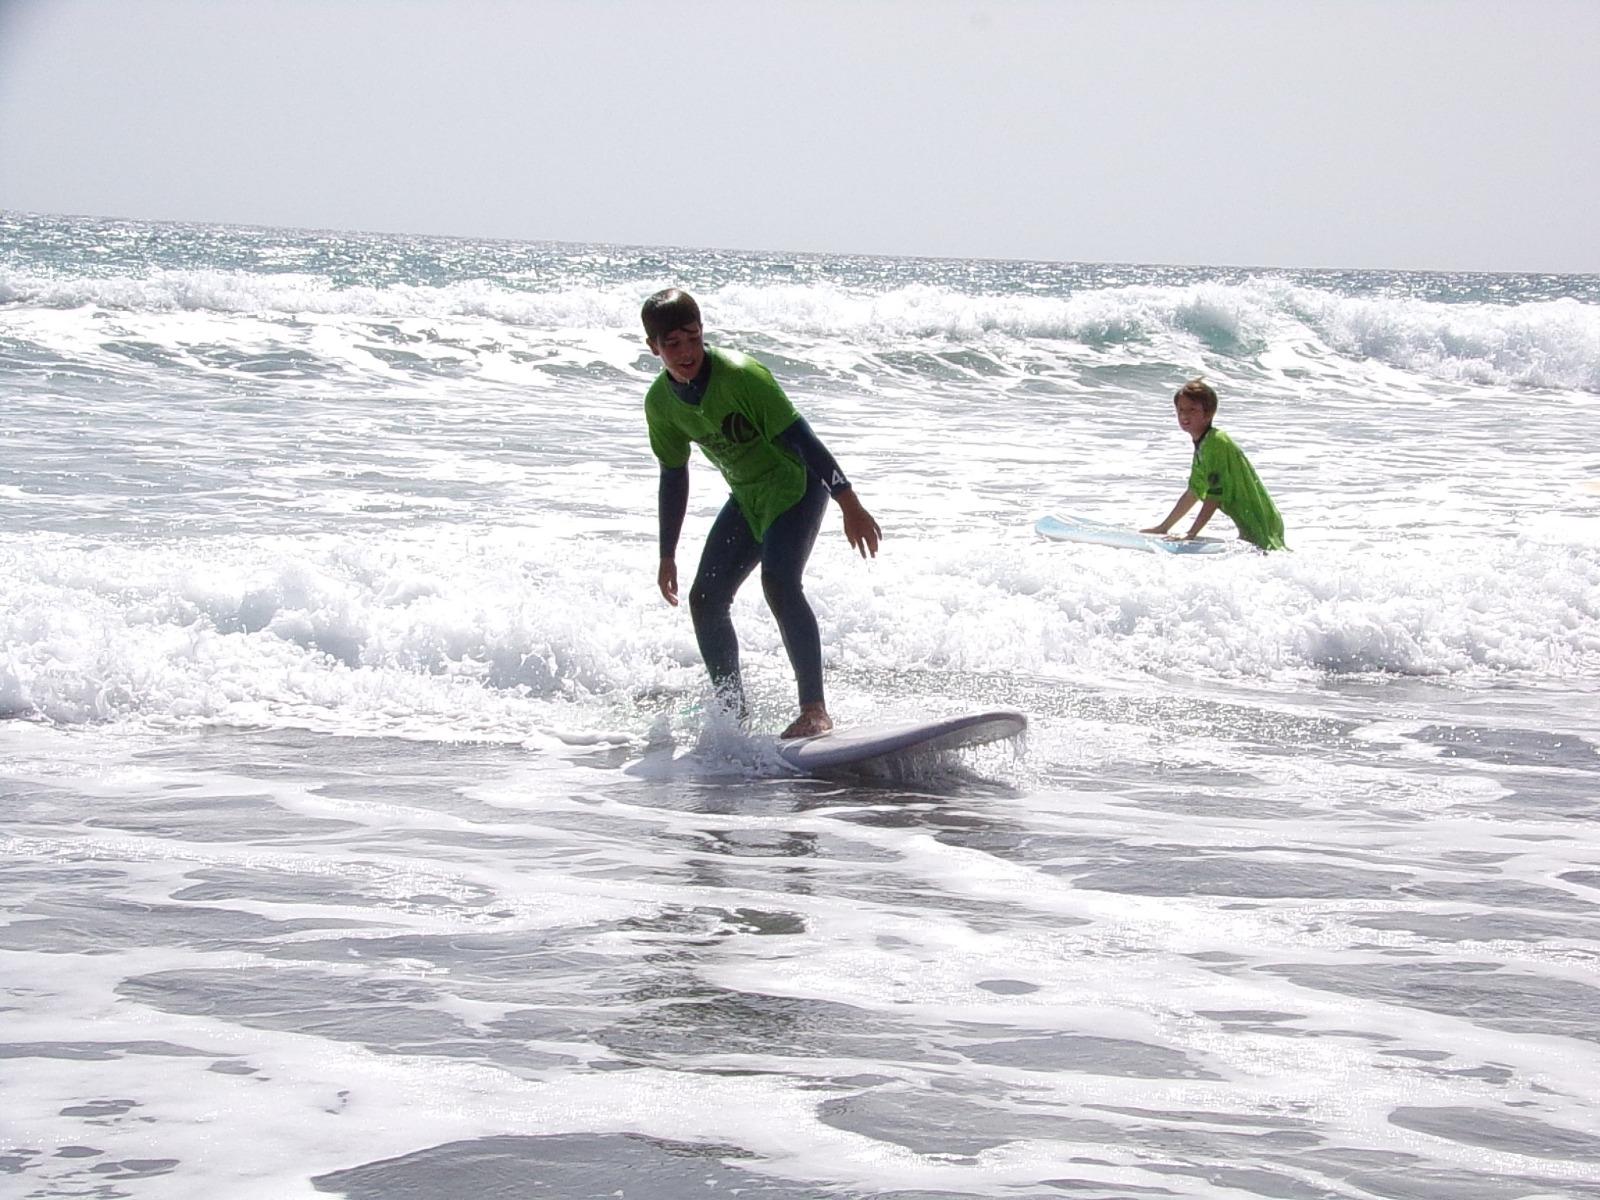 VERANO 2019 2 FUERTE TRIBU SURFWhatsApp Image 2019-08-15 at 15.49.35.jpeg